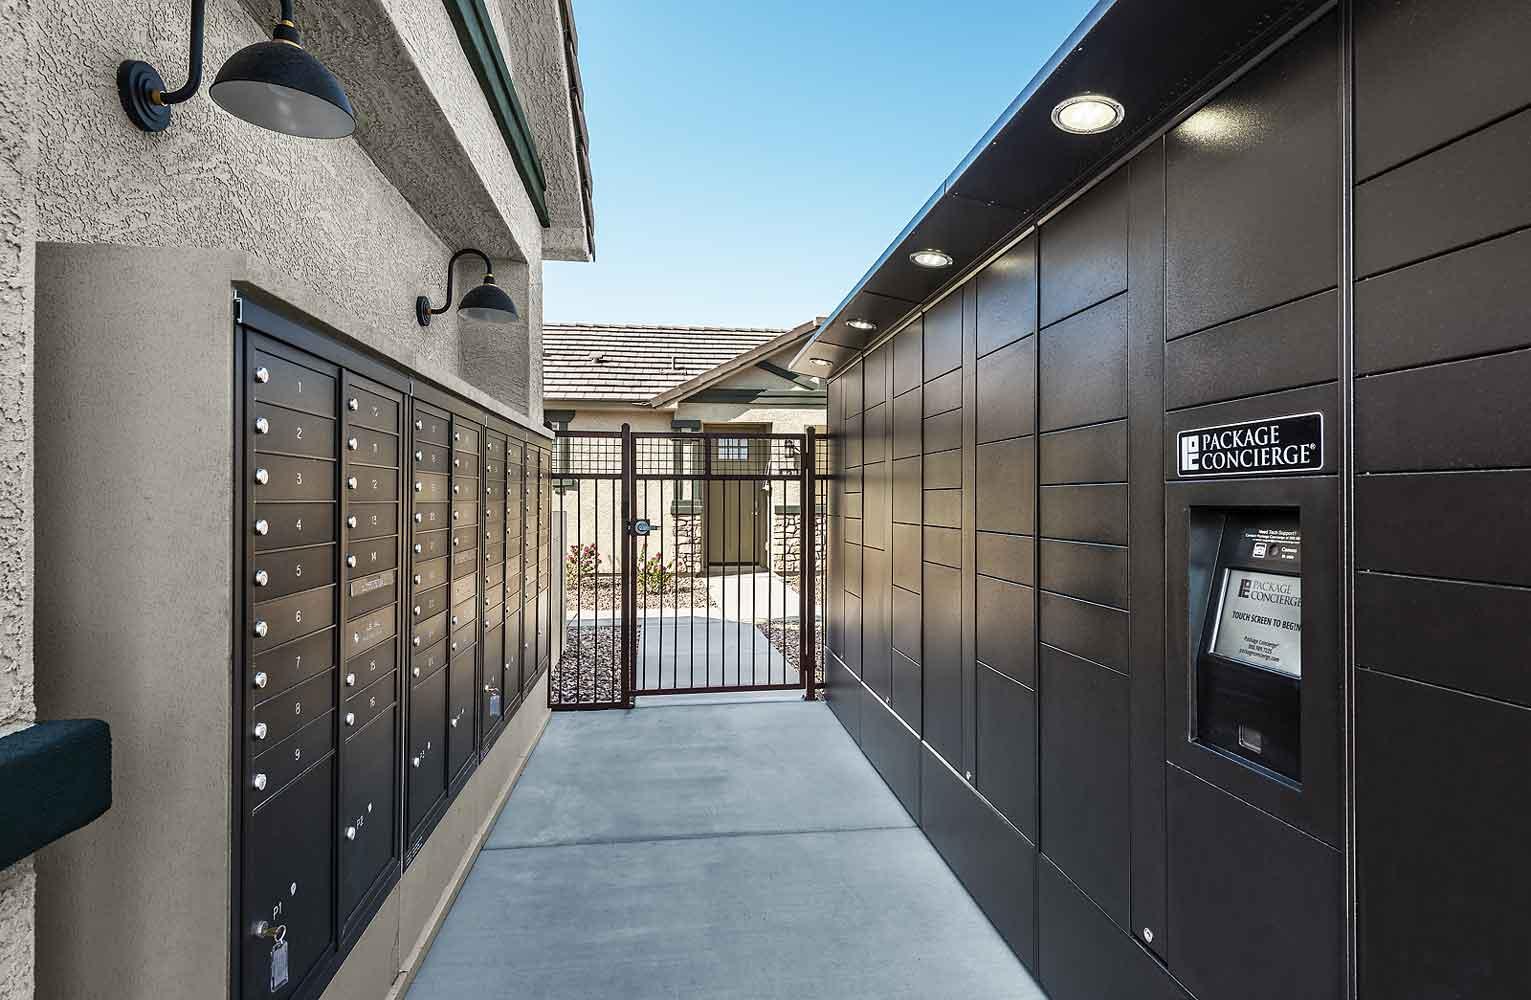 Storage Units at Harvard Crossing Apartments in Goodyear, AZ